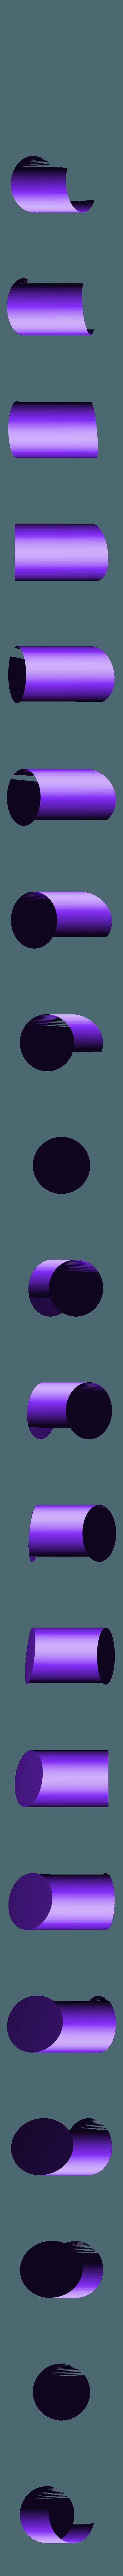 eye int left.stl Download free STL file Toadette from Mario games - Multi-color • 3D printing design, bpitanga